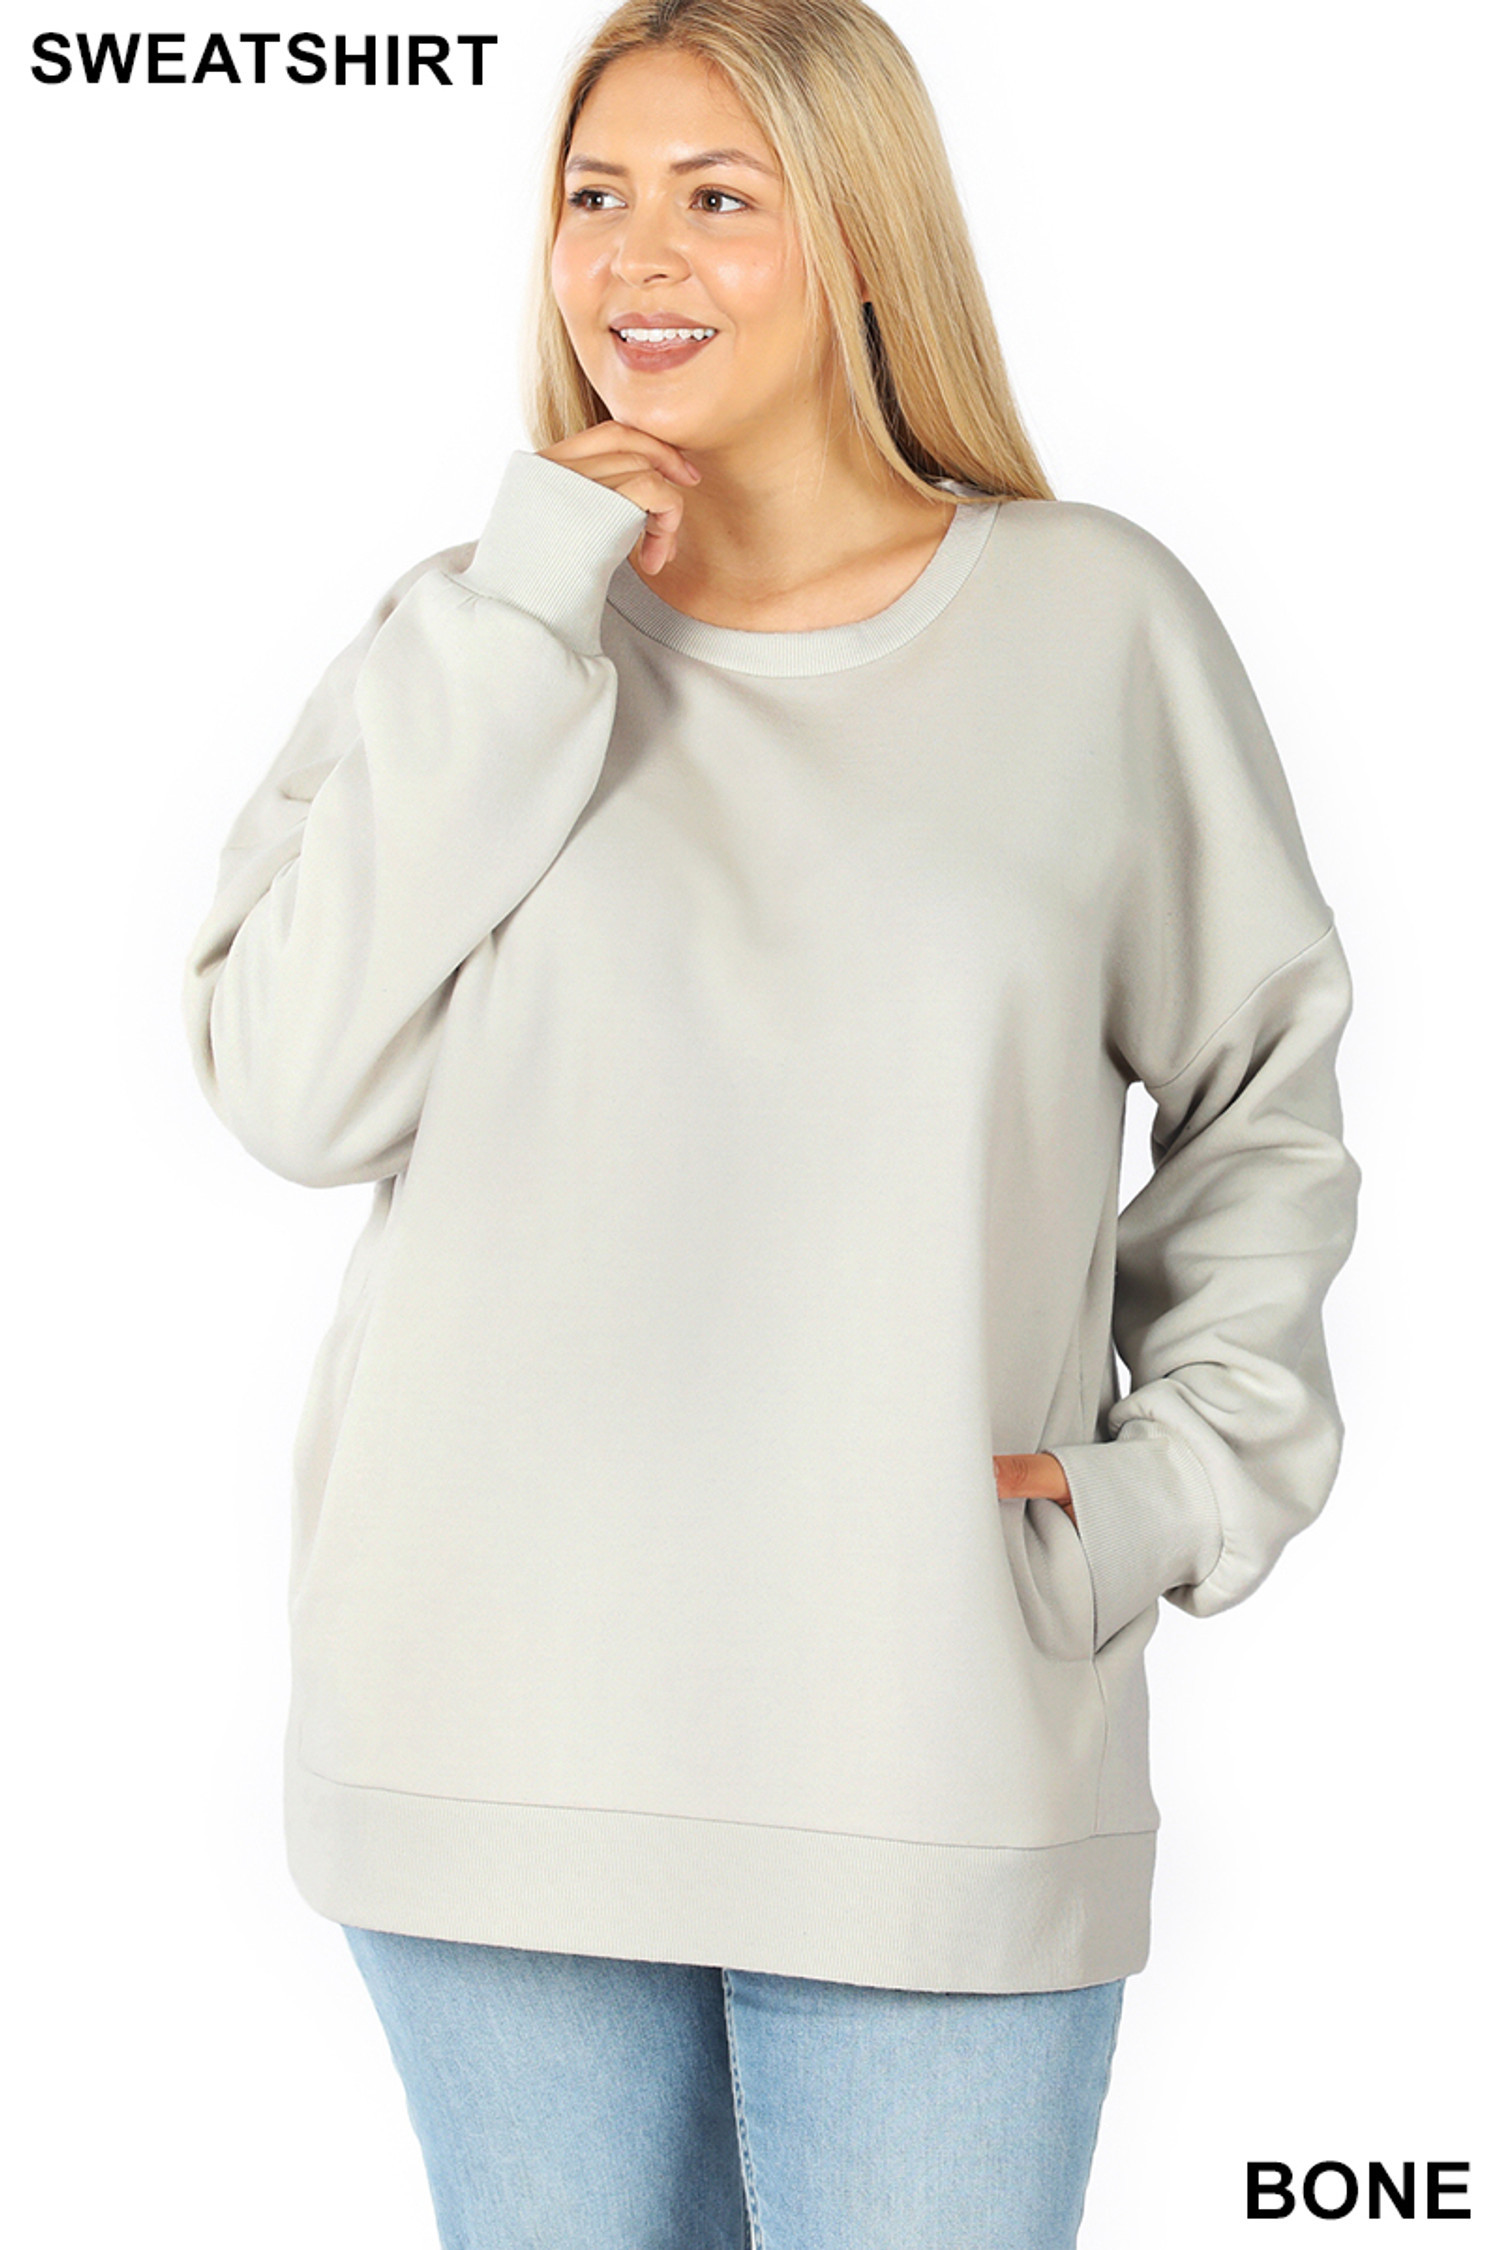 Front image of Bone  Cotton Round Crew Neck Plus Size Sweatshirt with Side Pockets